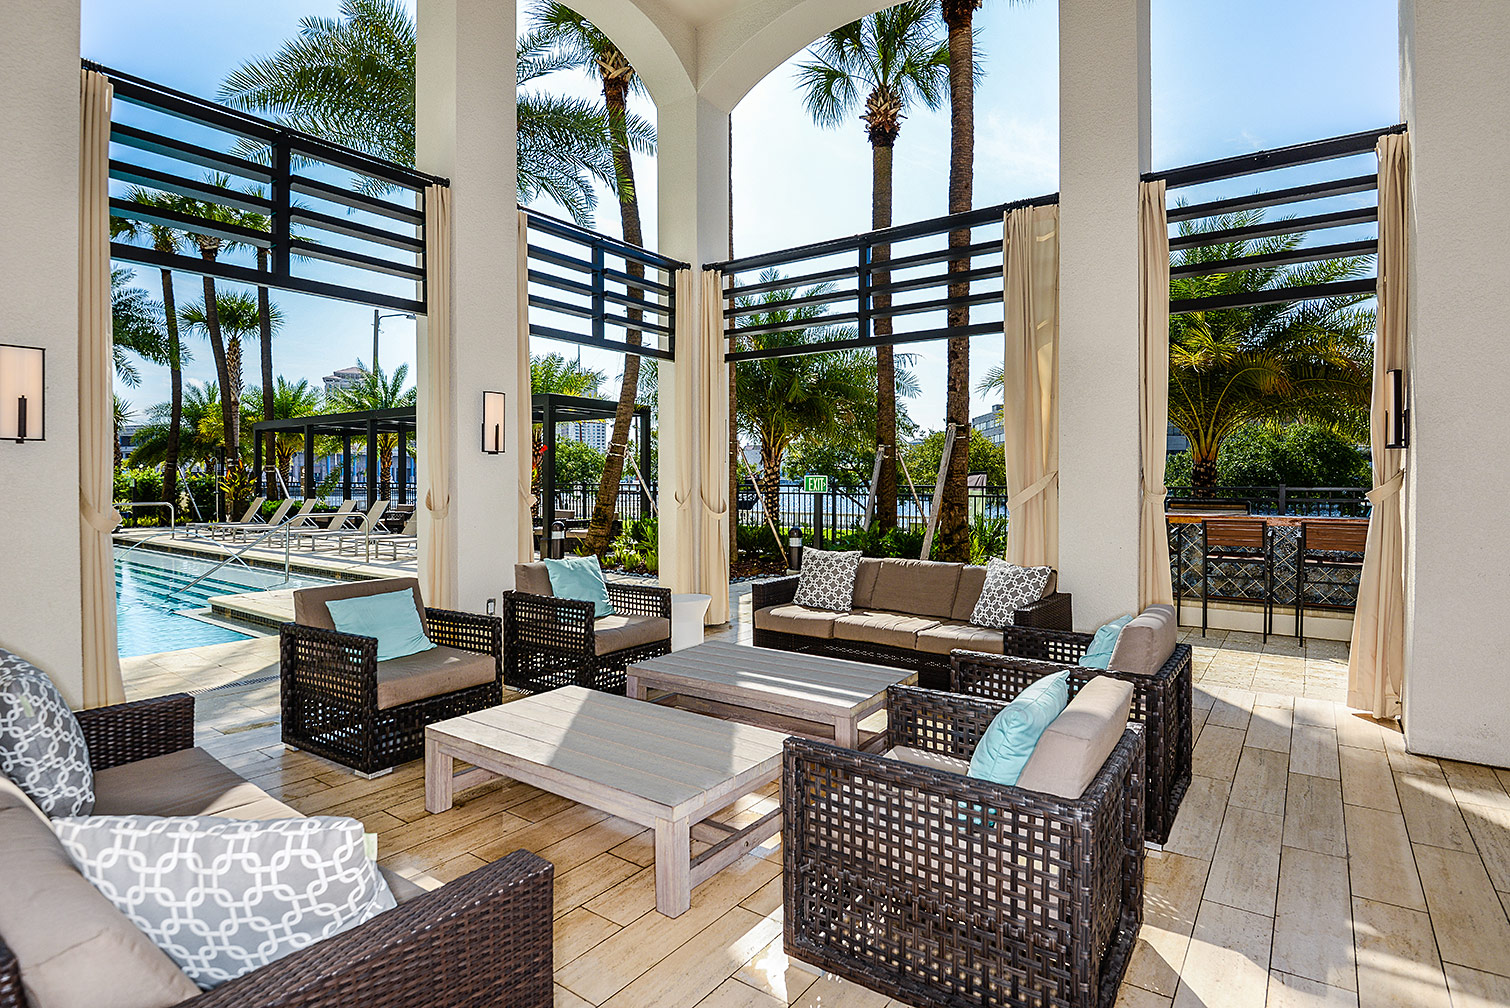 2 bayshore new luxury downtown tampa florida apartments